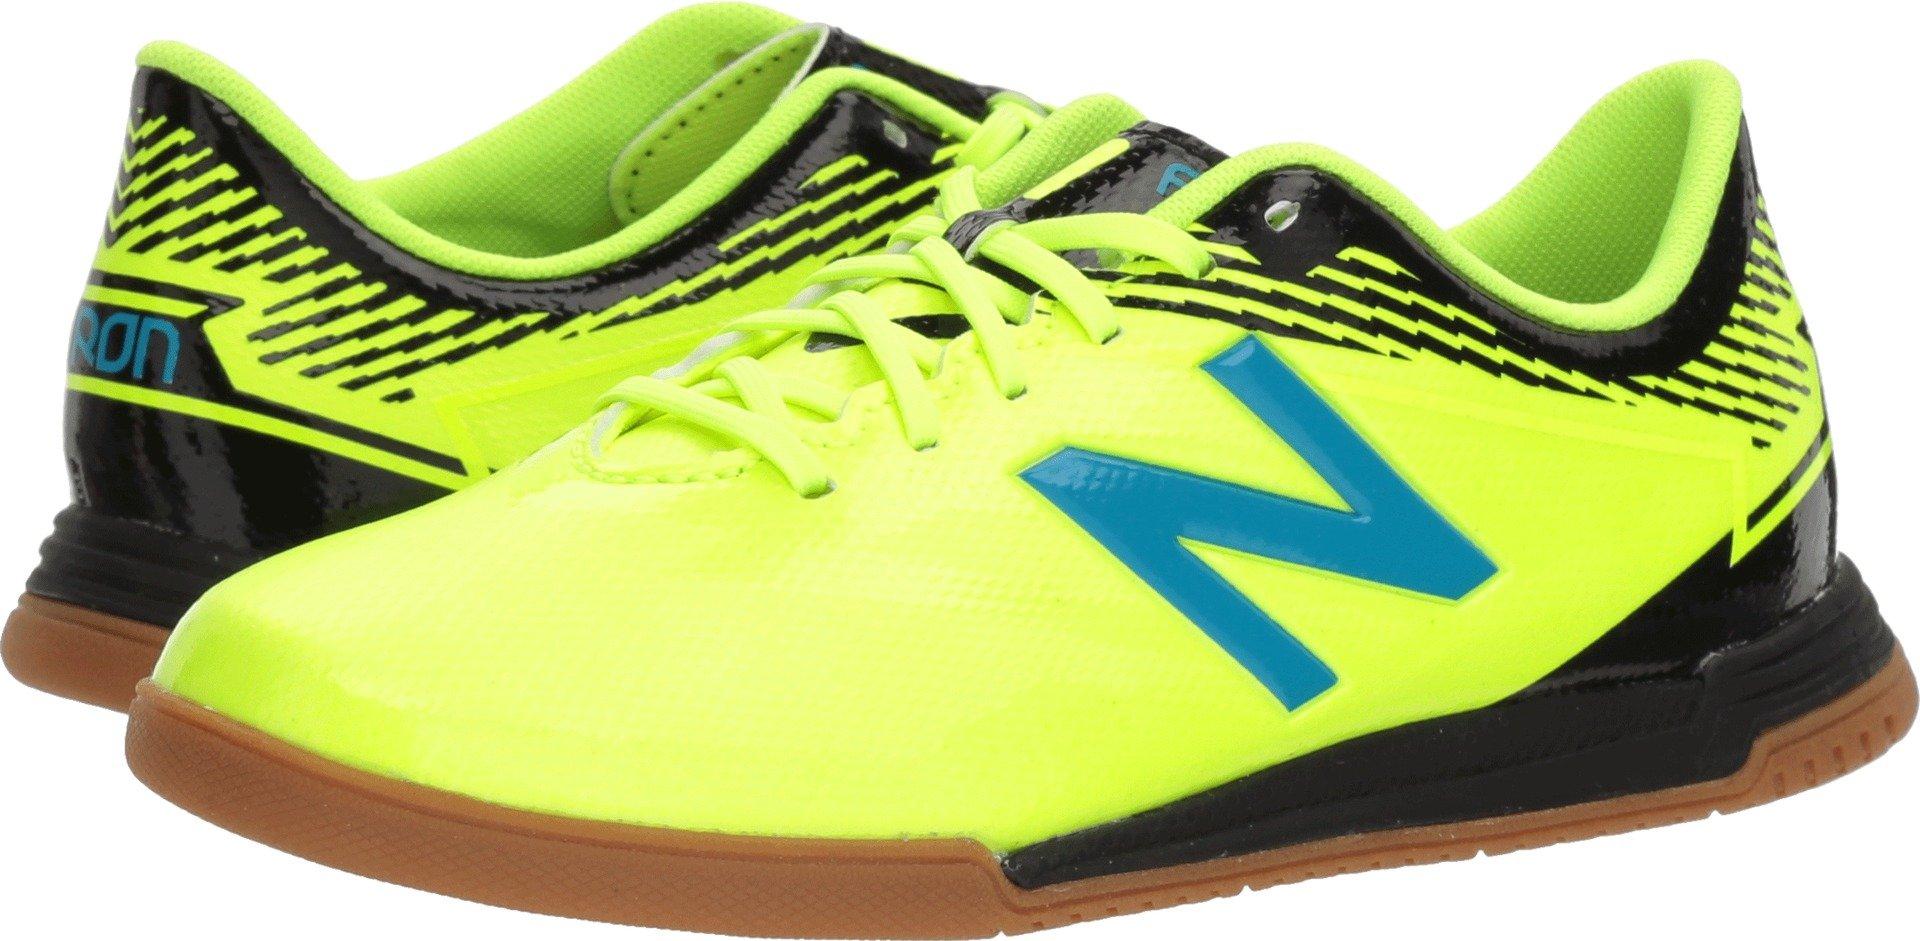 New Balance Boys' Furon3.0 Dispatch JNR in Soccer Shoe, hi lite/Maldives, 11 M US Little Kid